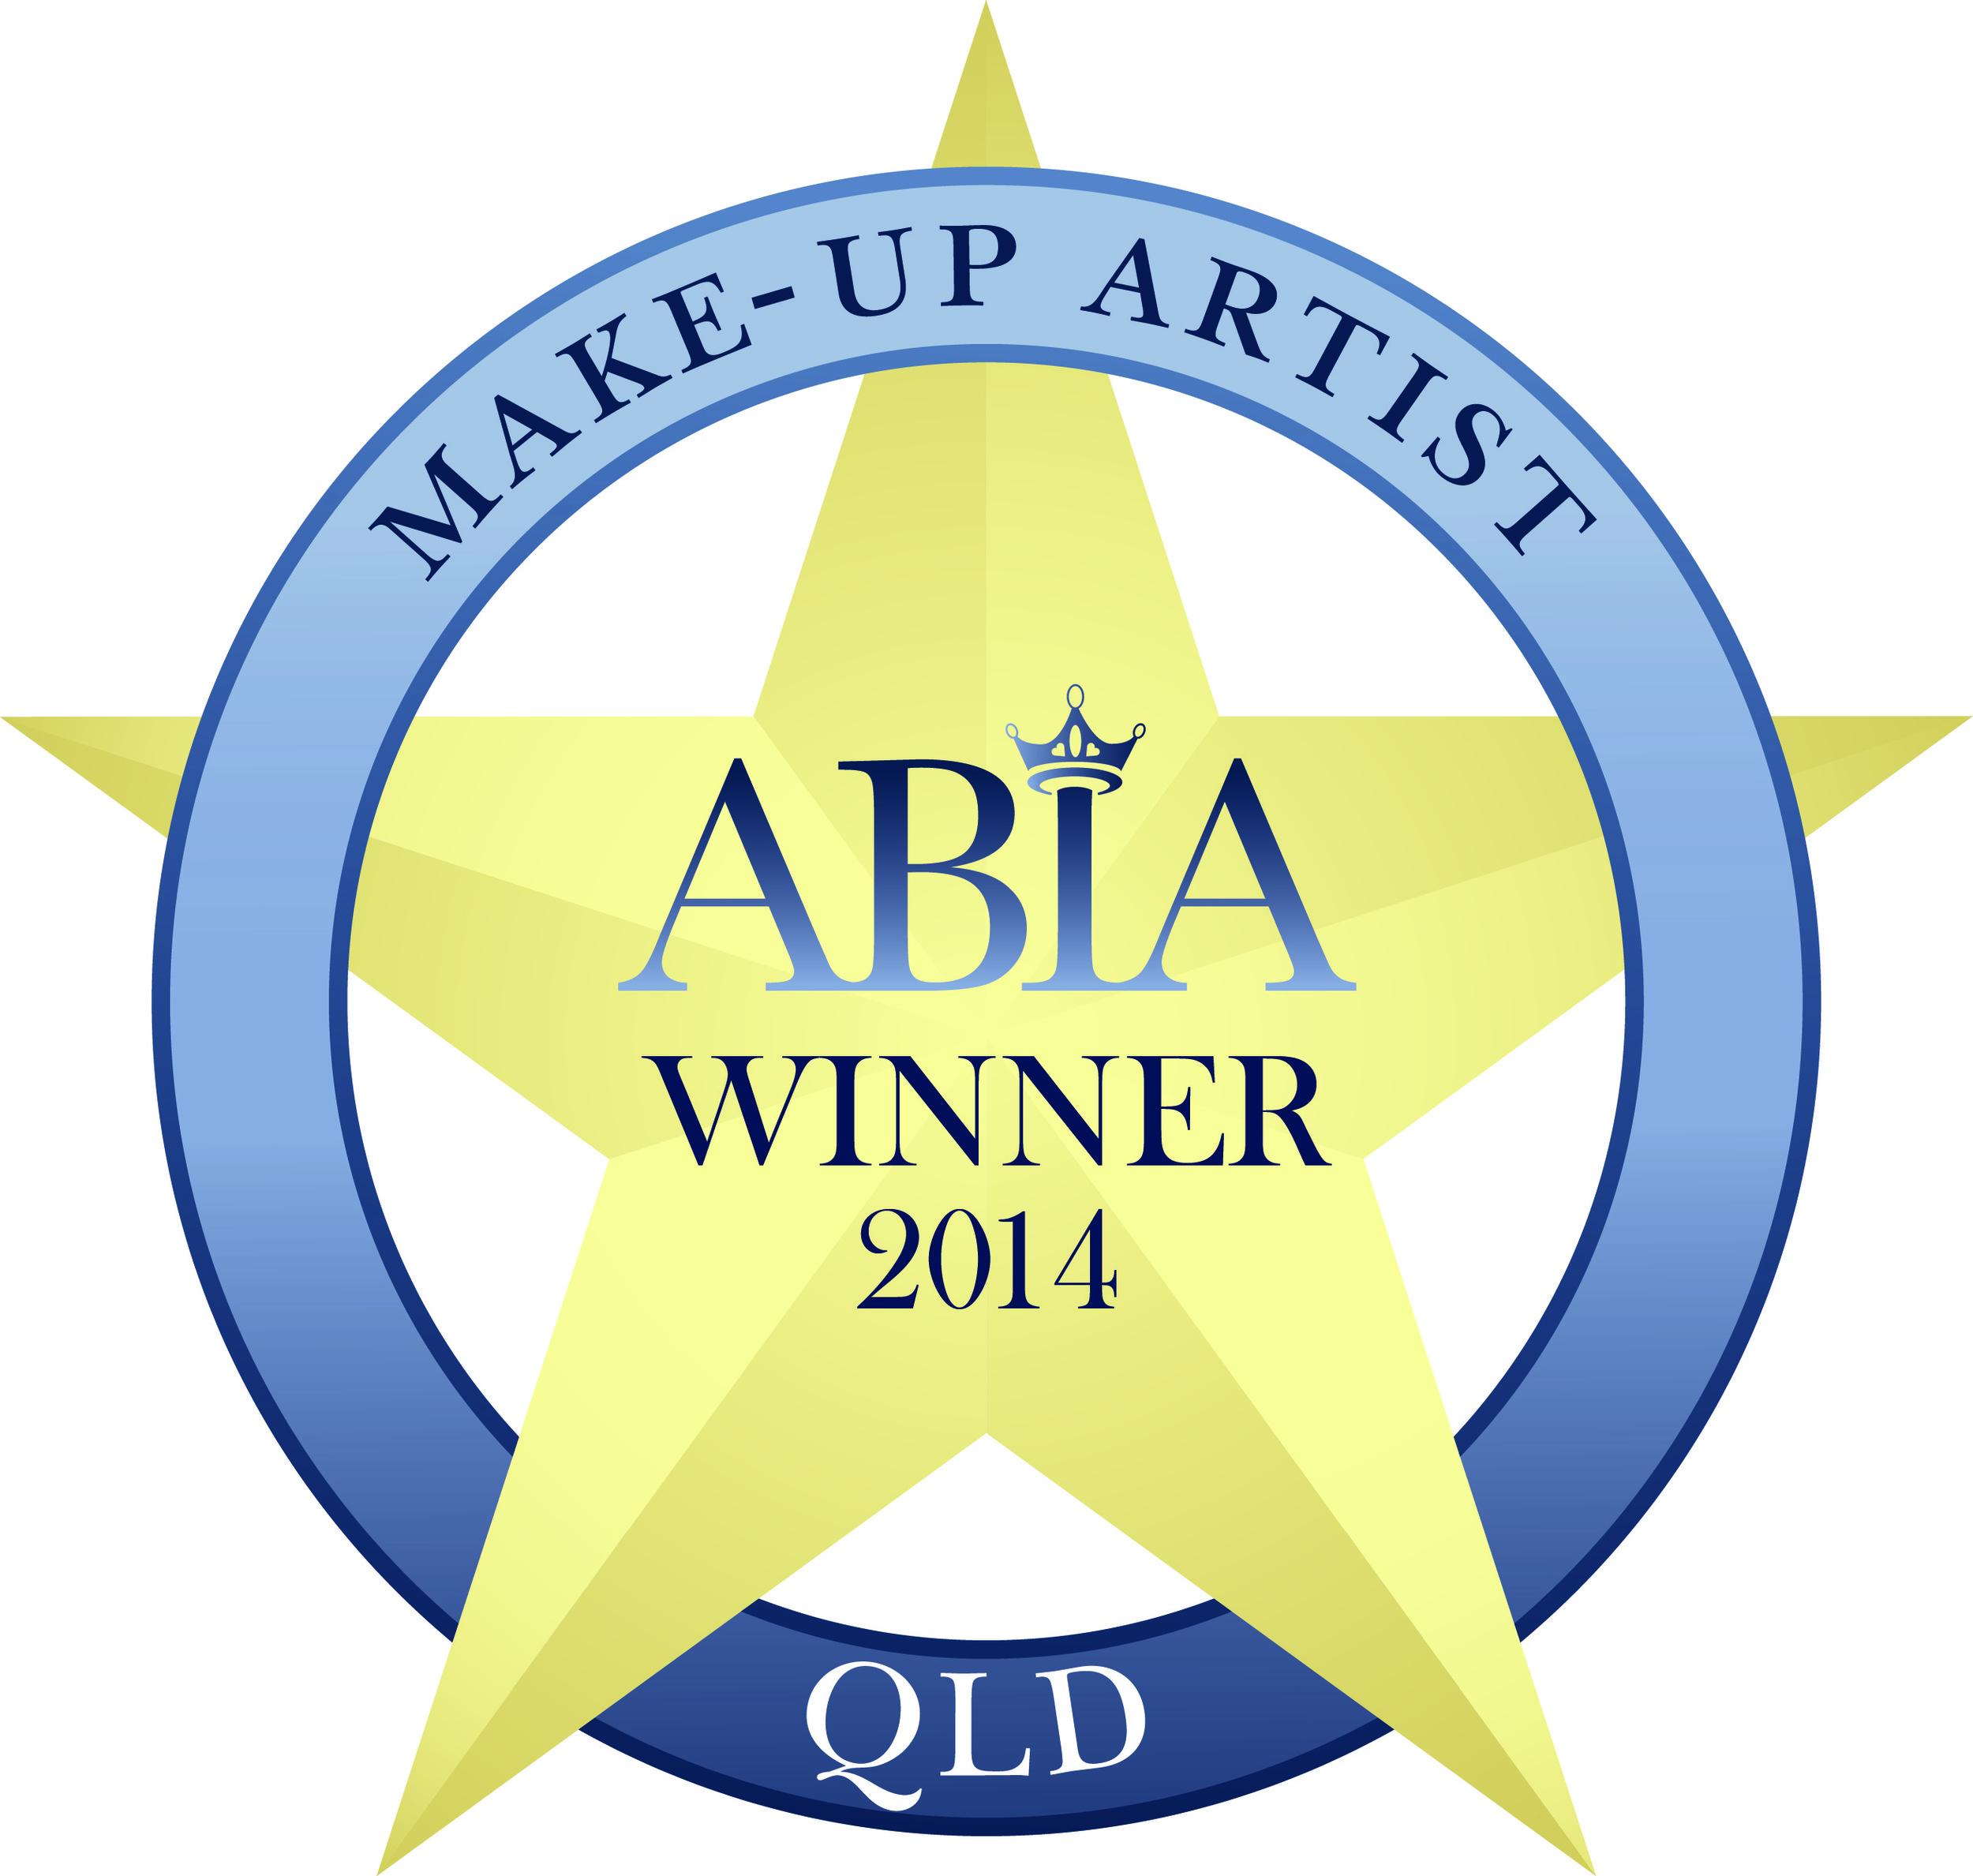 ABIA_Print_Winner_MakeupArtist14